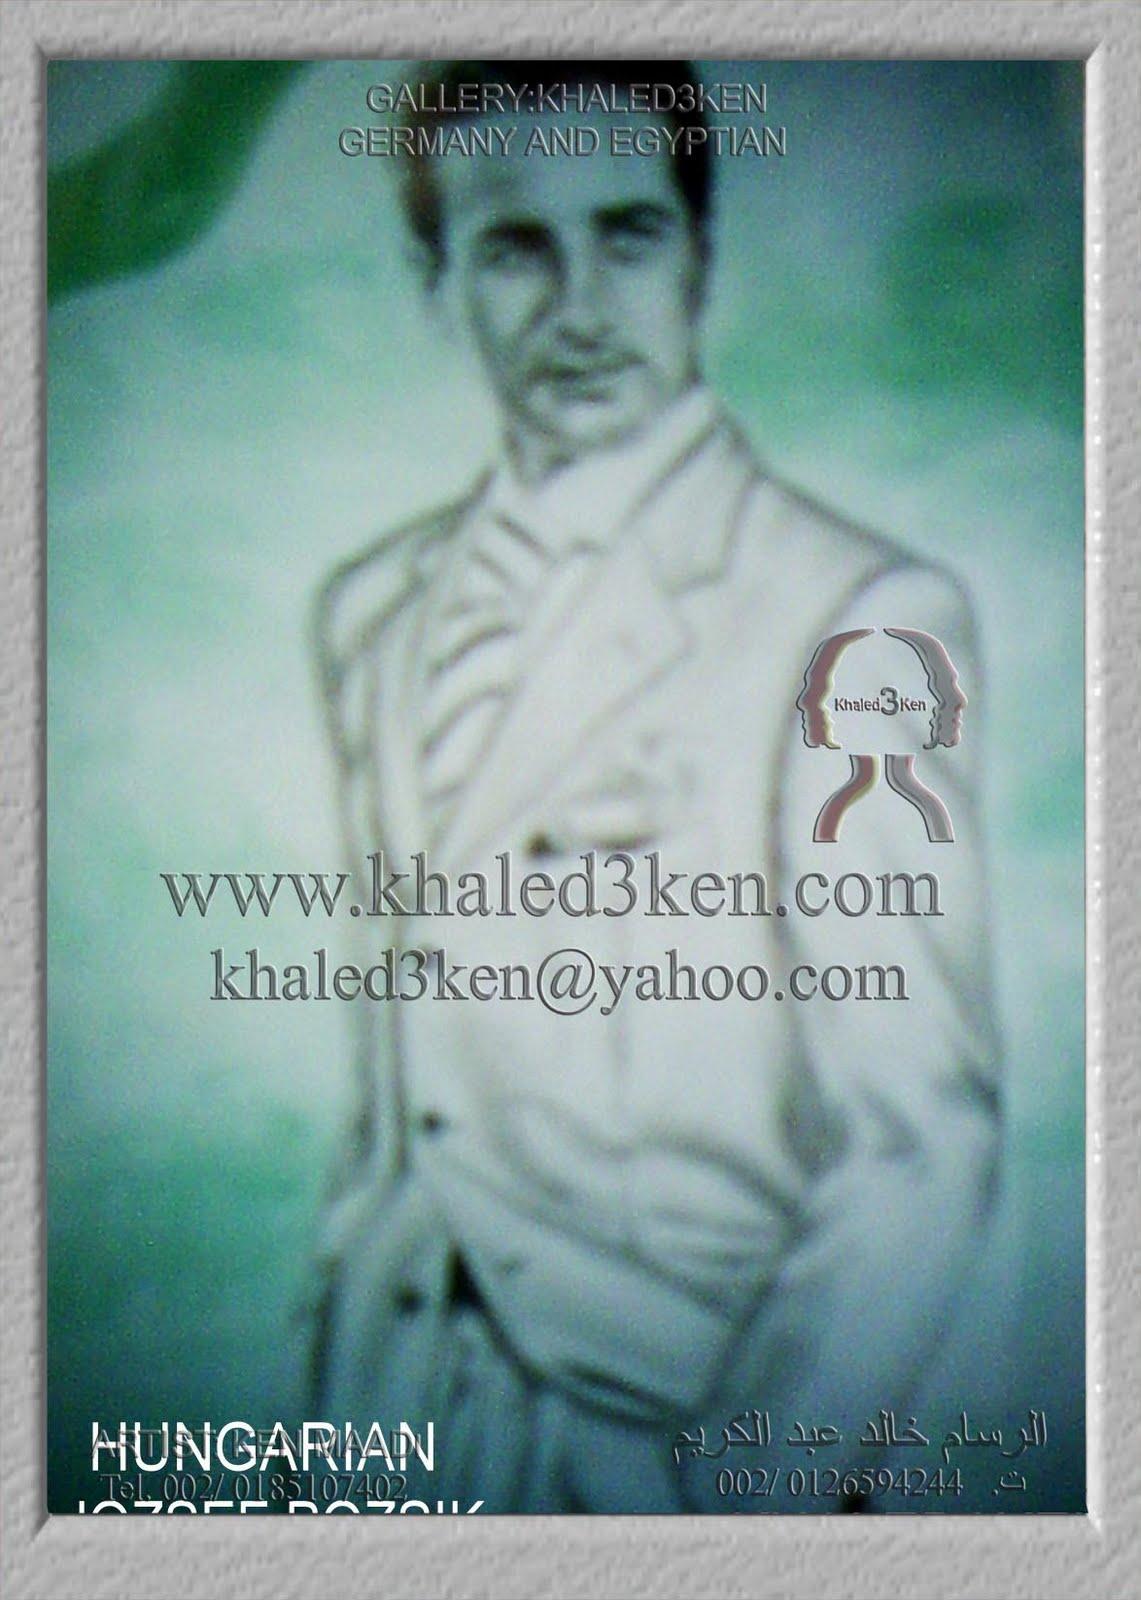 Football Khaled3Ken DRAWING PORTRAIT KHALED3KEN ARTIST KHALED ABD